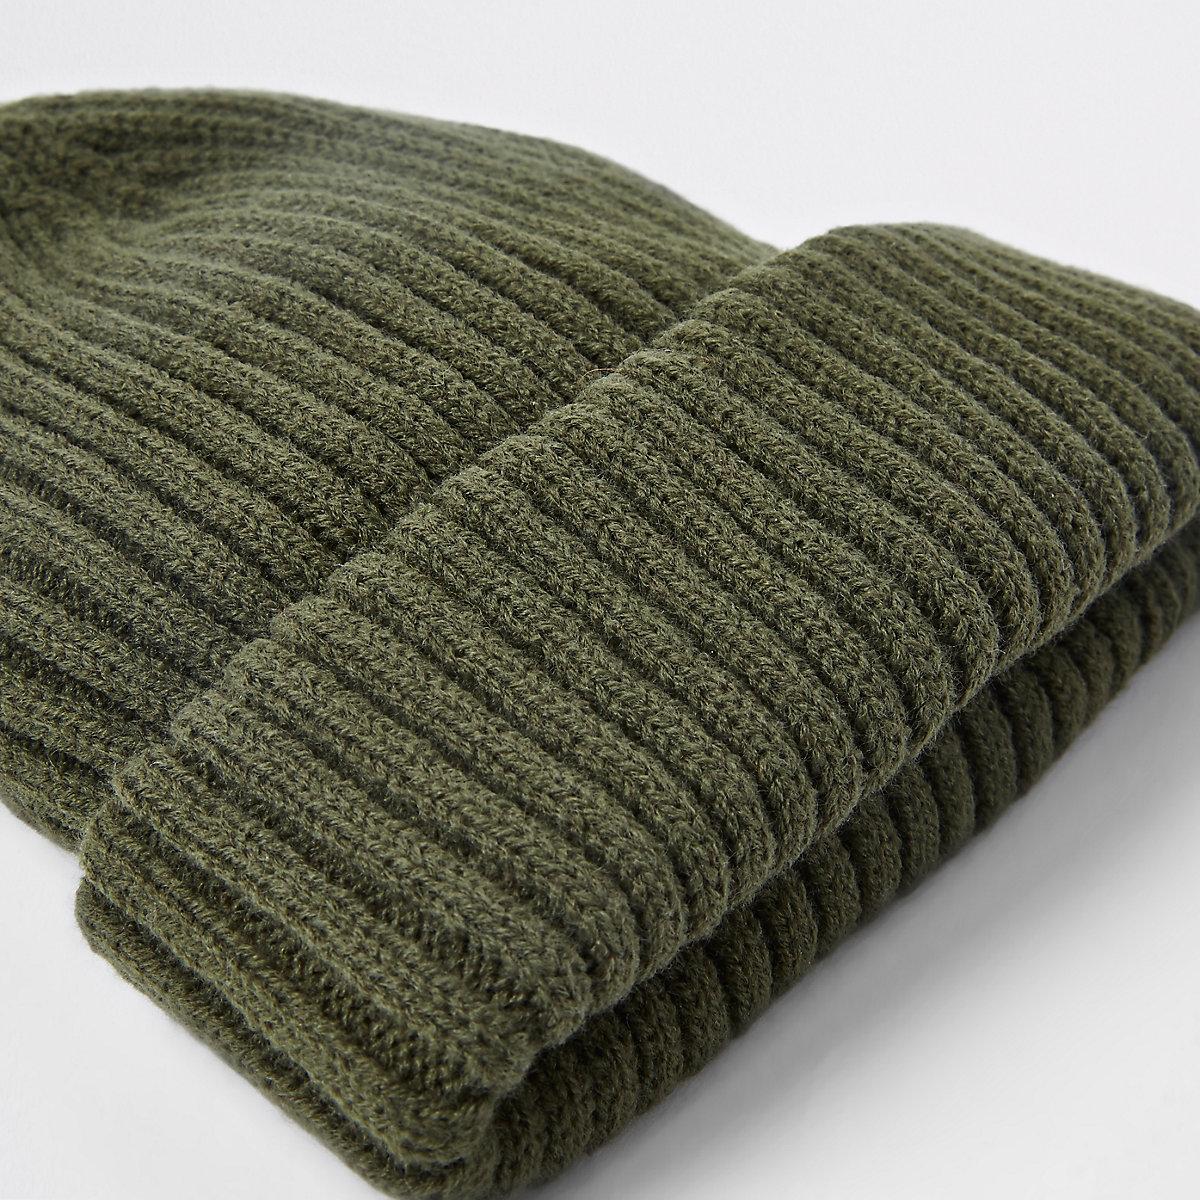 Khaki green fisherman knit beanie hat - Hats   Caps - Accessories - men 7cbe734f2de6